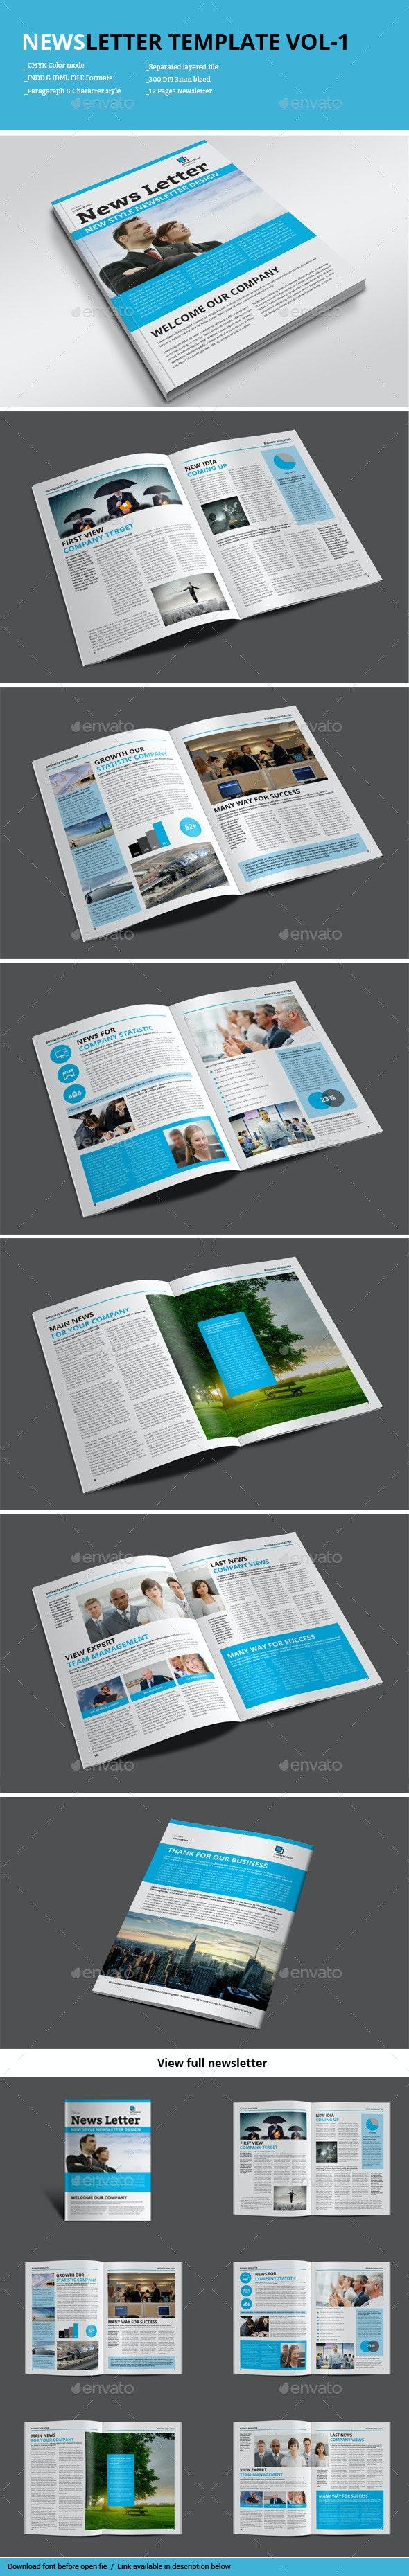 Newsletter Template Vol-1 - Newsletters Print Templates